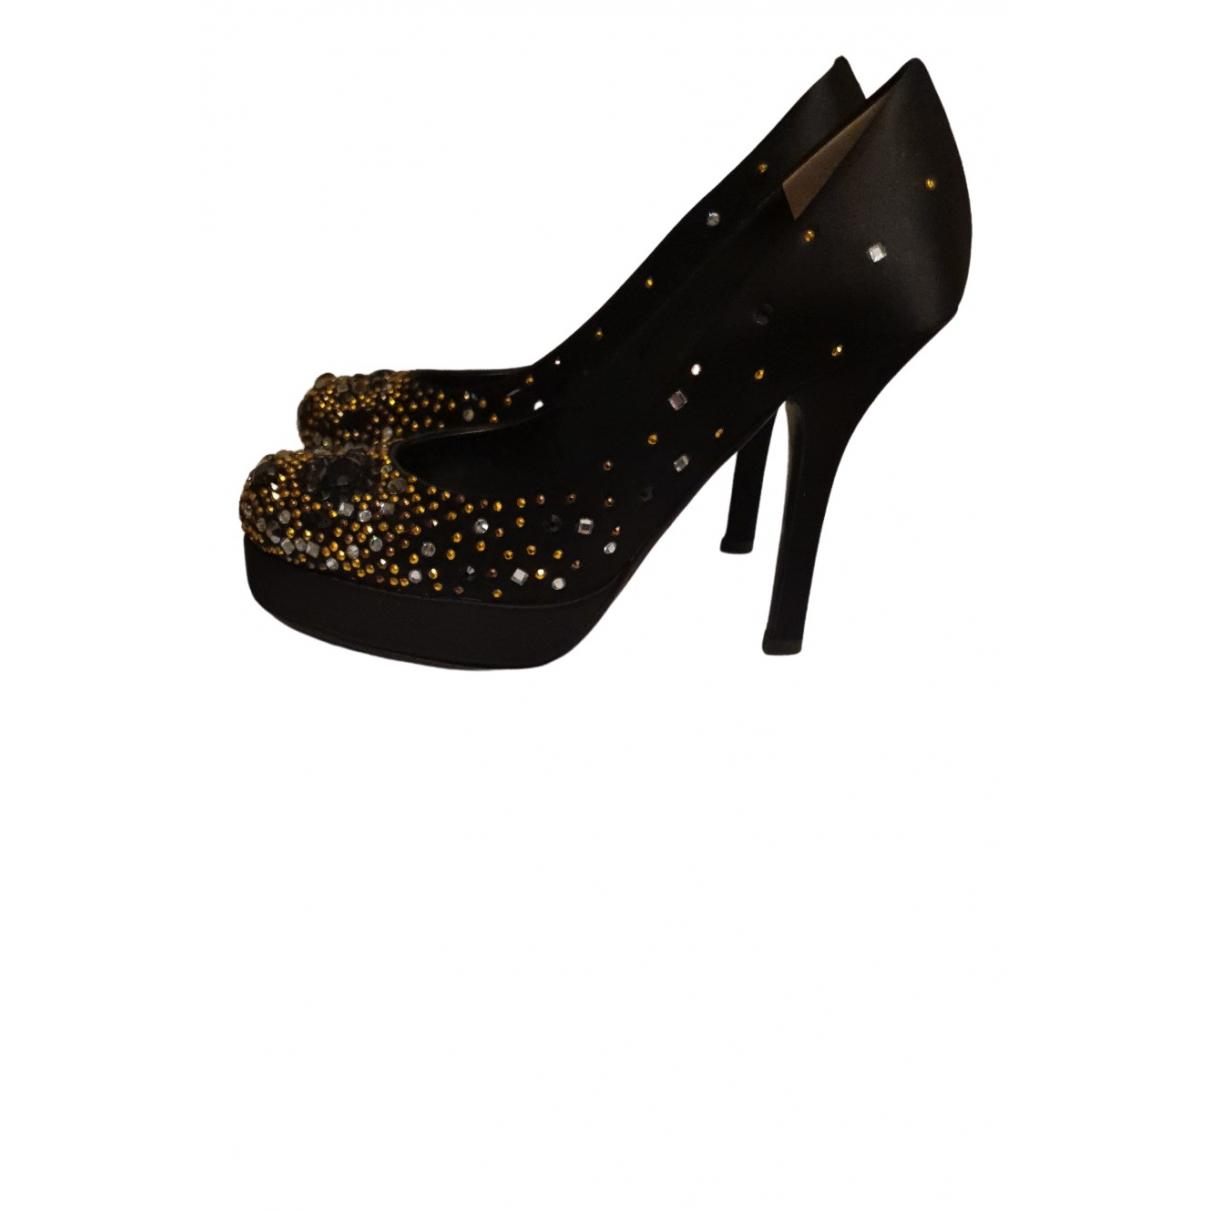 D&g N Black Cloth Heels for Women 38 EU